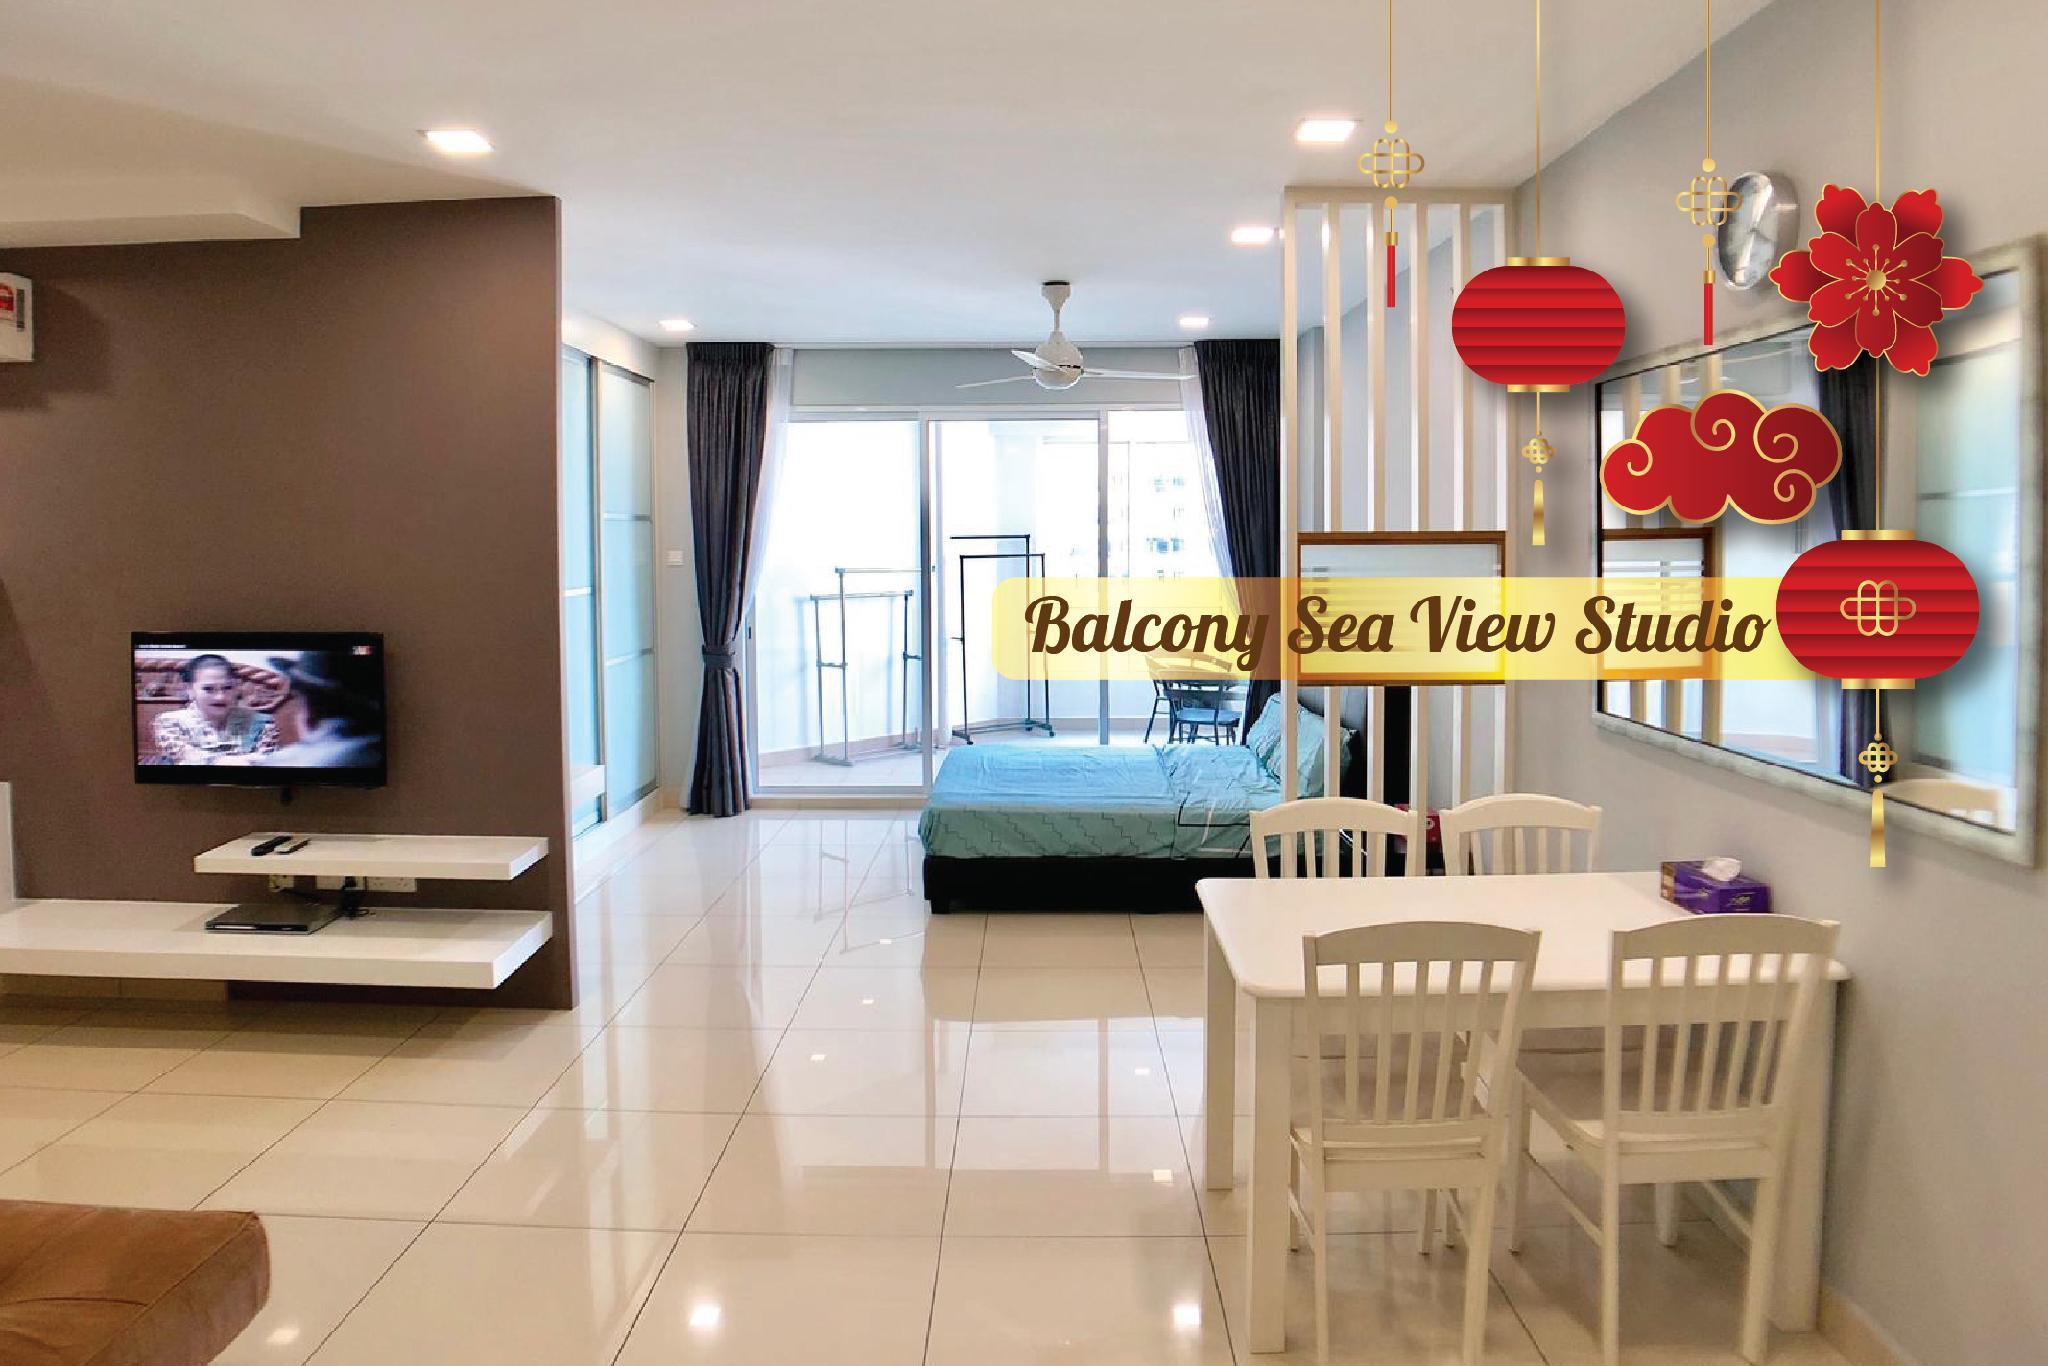 Balcony Sea View Studio @Mansion One